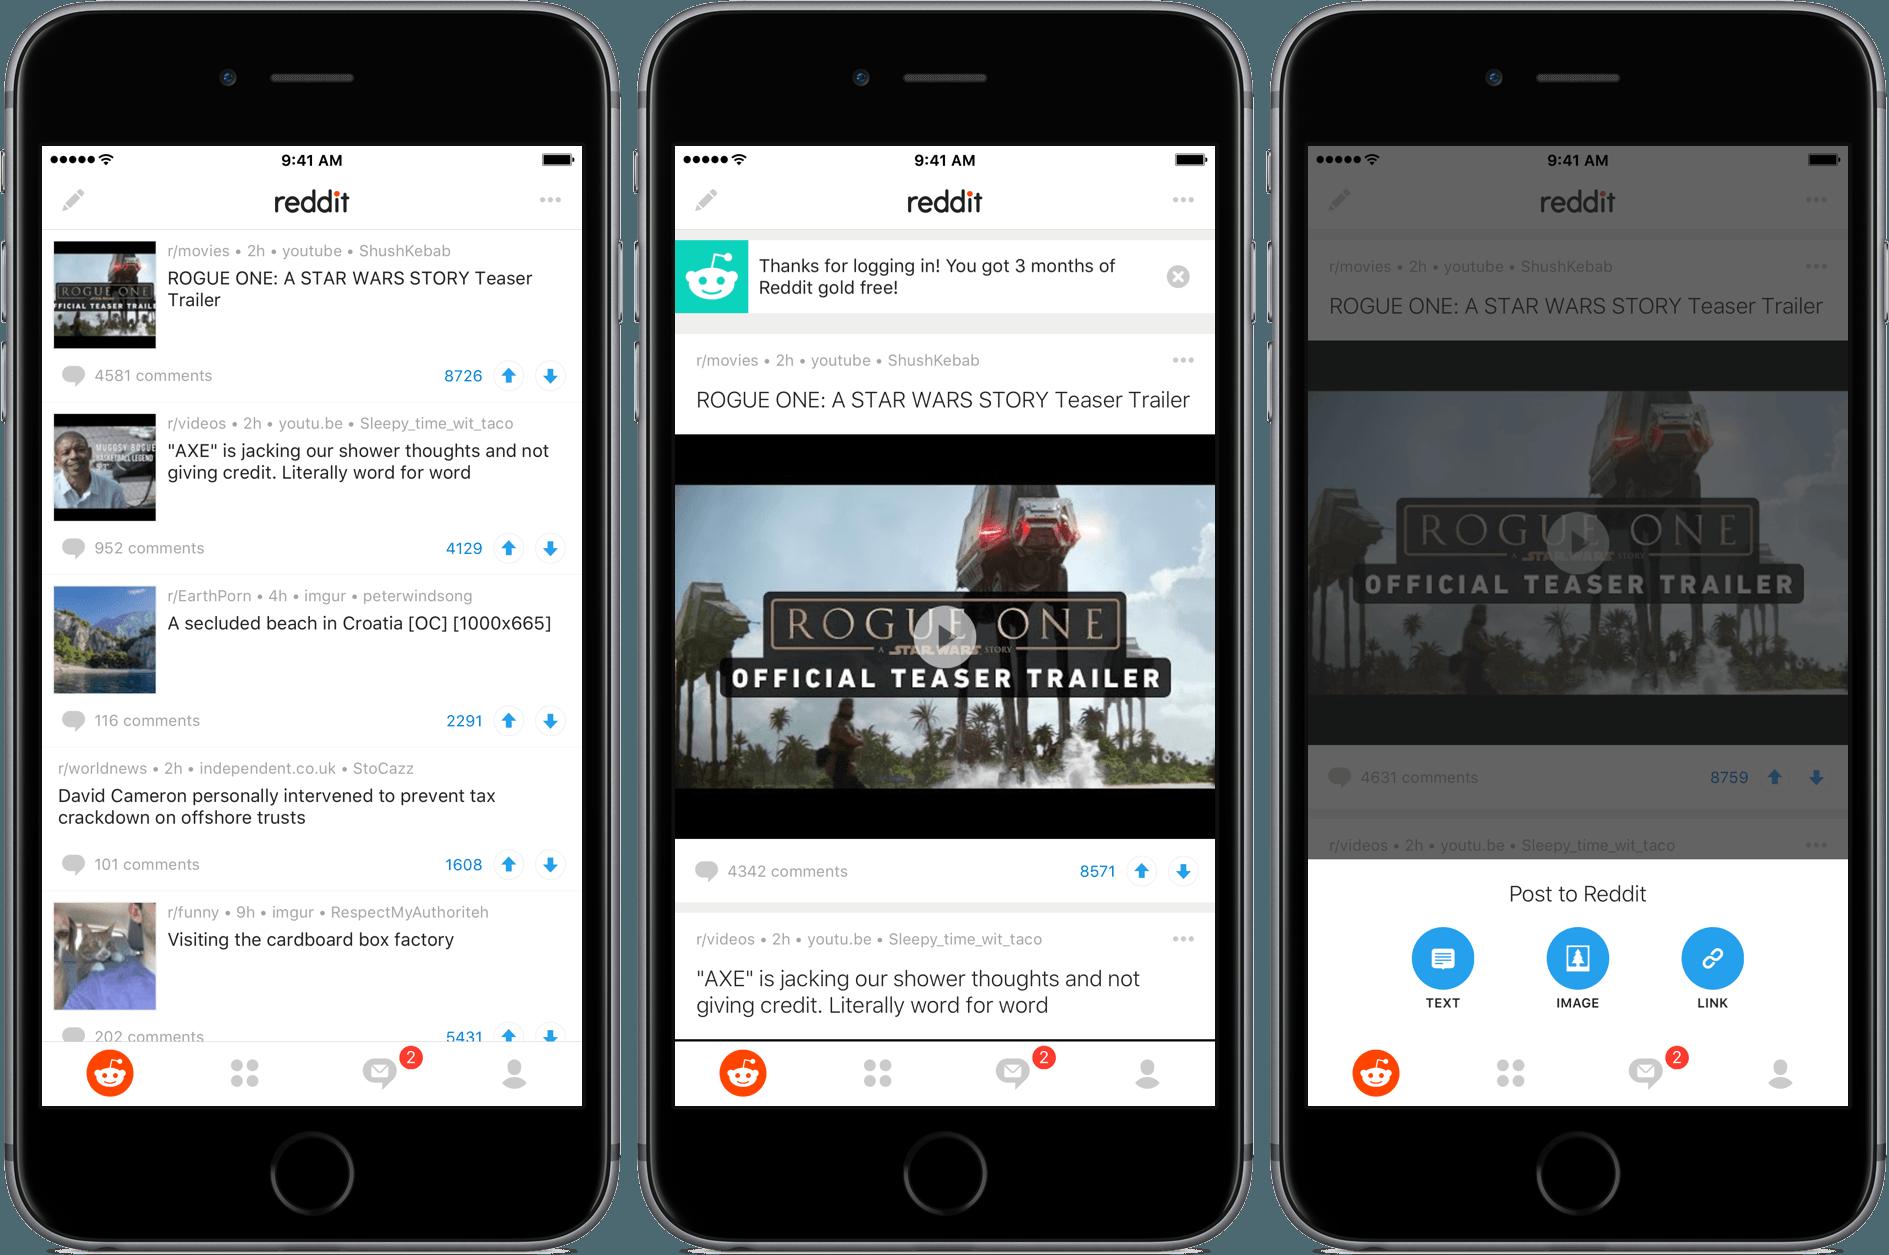 Reddit Launches Official iOS App Ios app, App, Phone apps